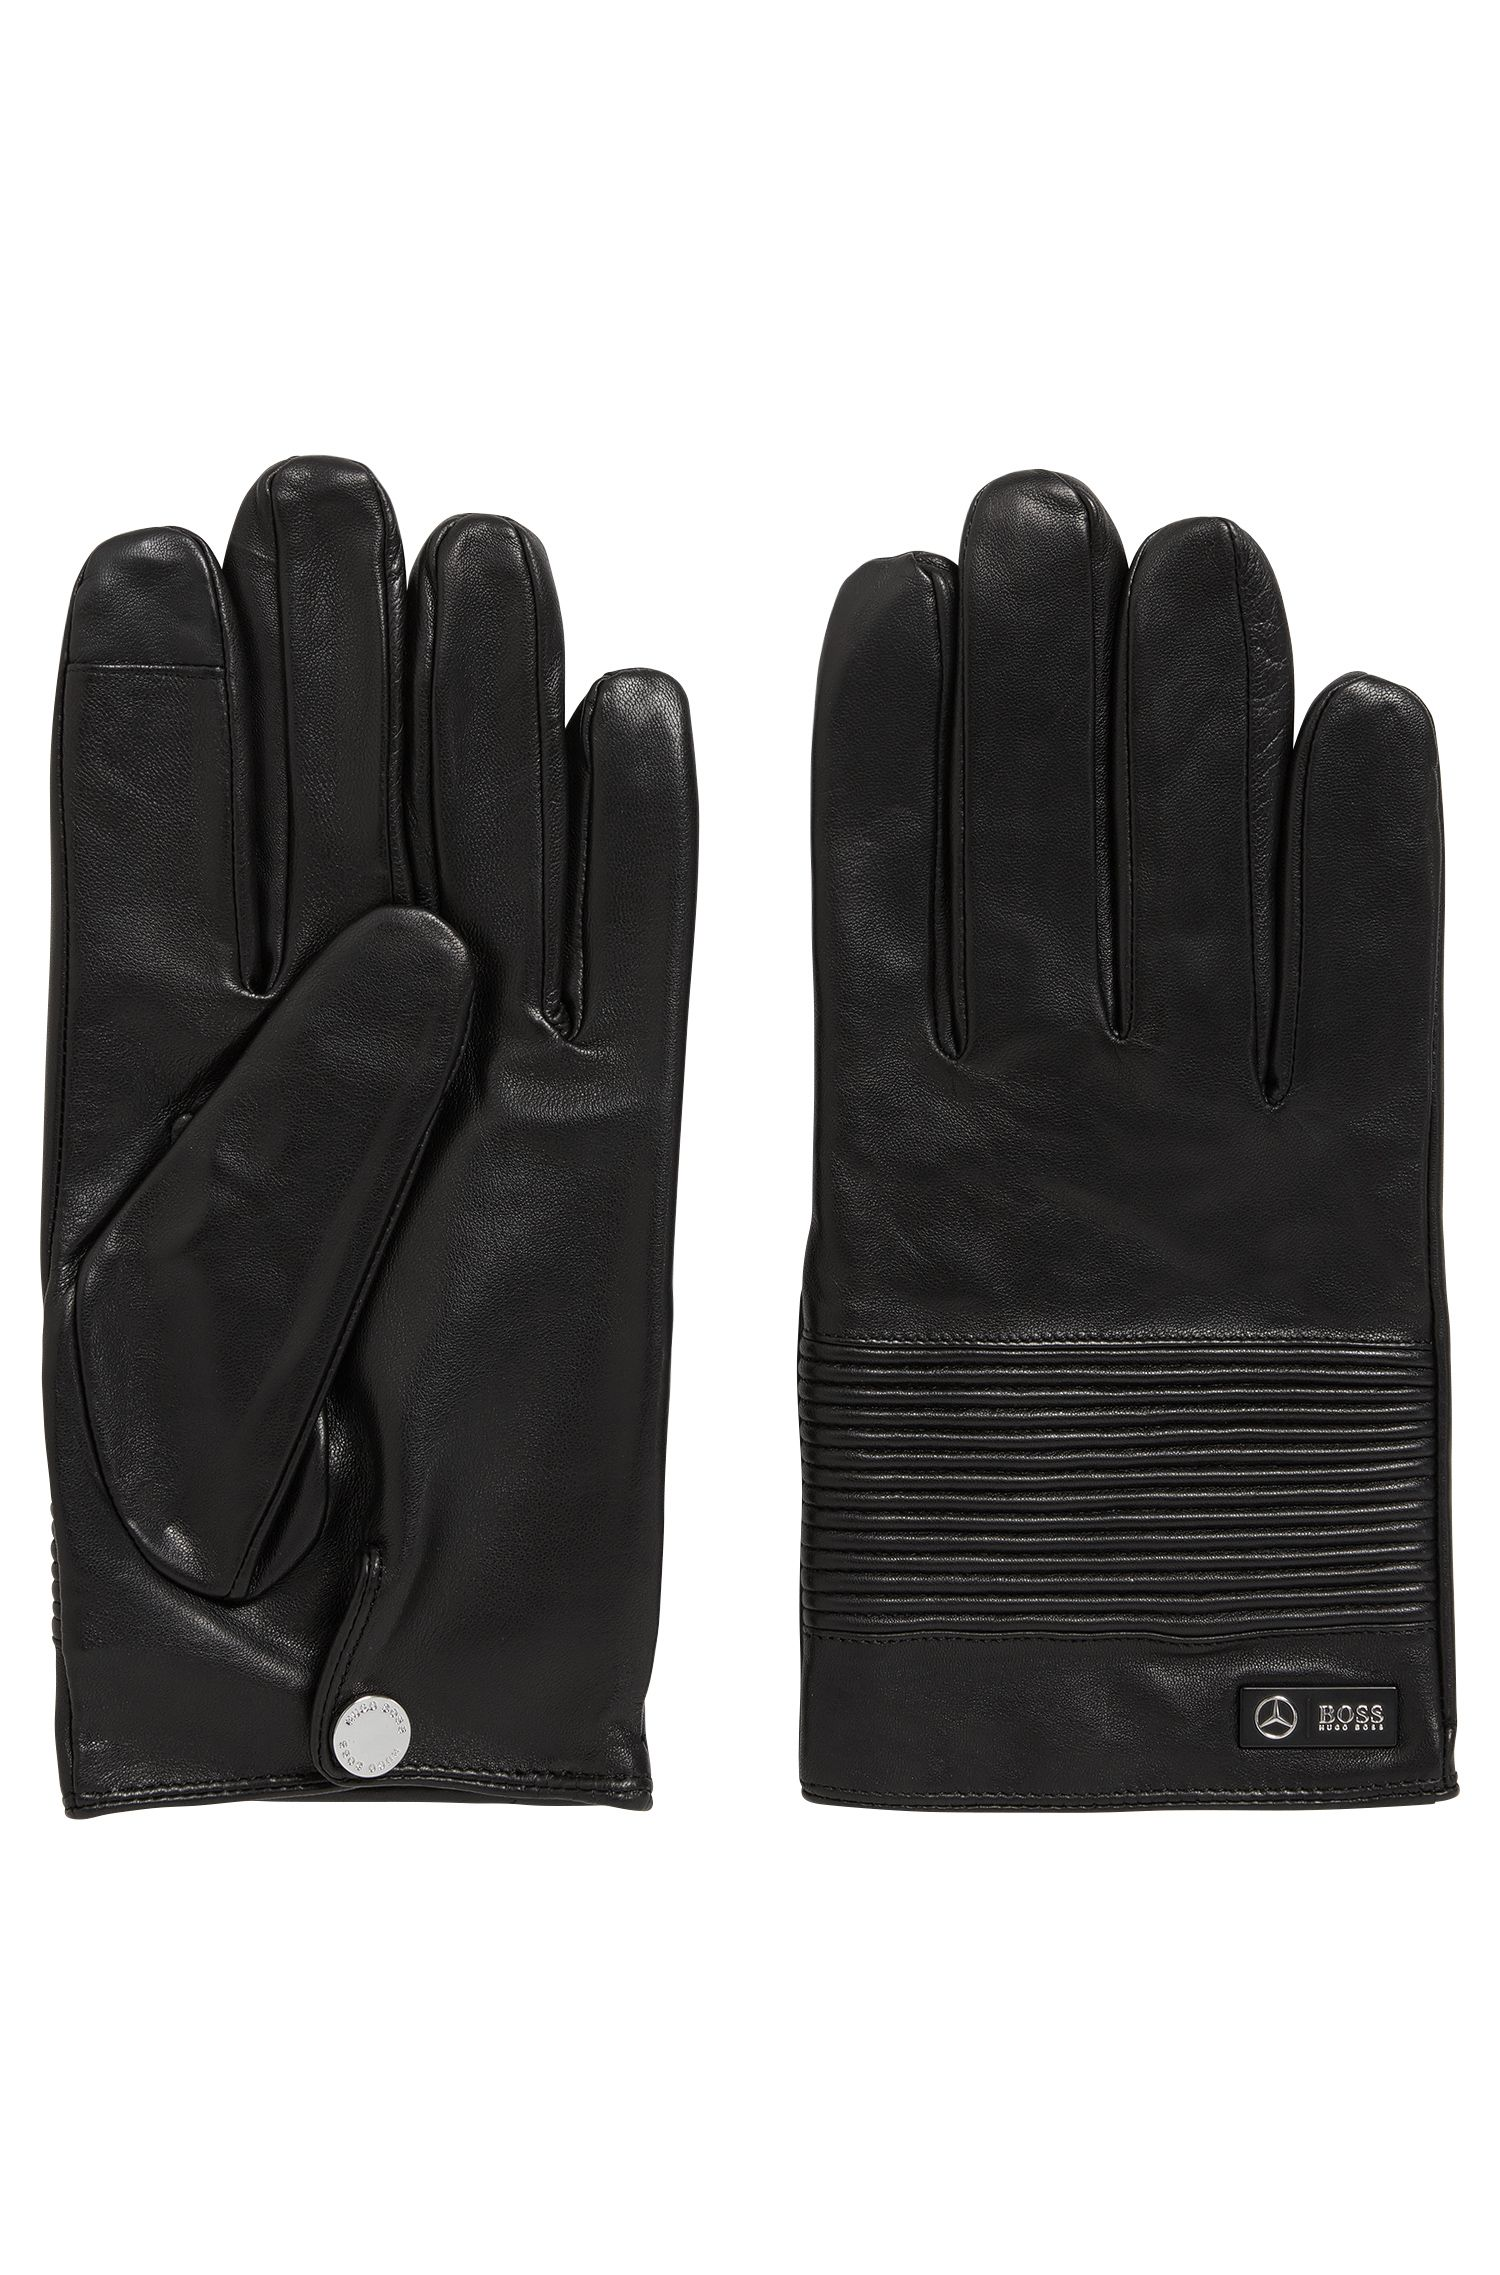 Mercedes-Benz Nappa Leather Tech Touch Glove | Kilo TT